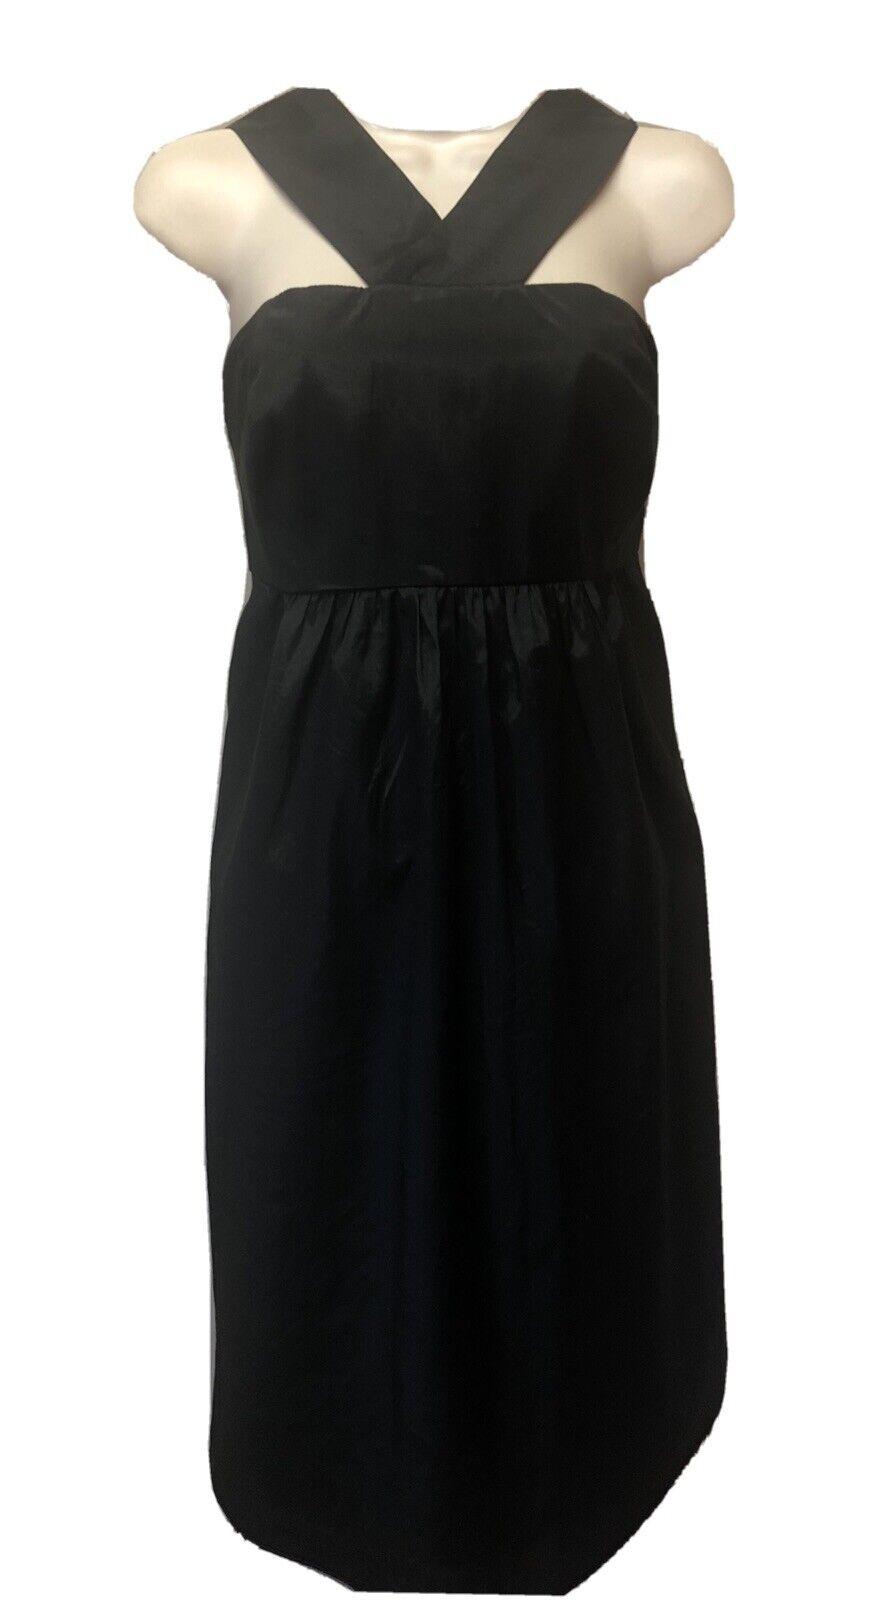 New The Limited Event Women's 8 Black Satin Empire Waist Sleeveless Halter Dress